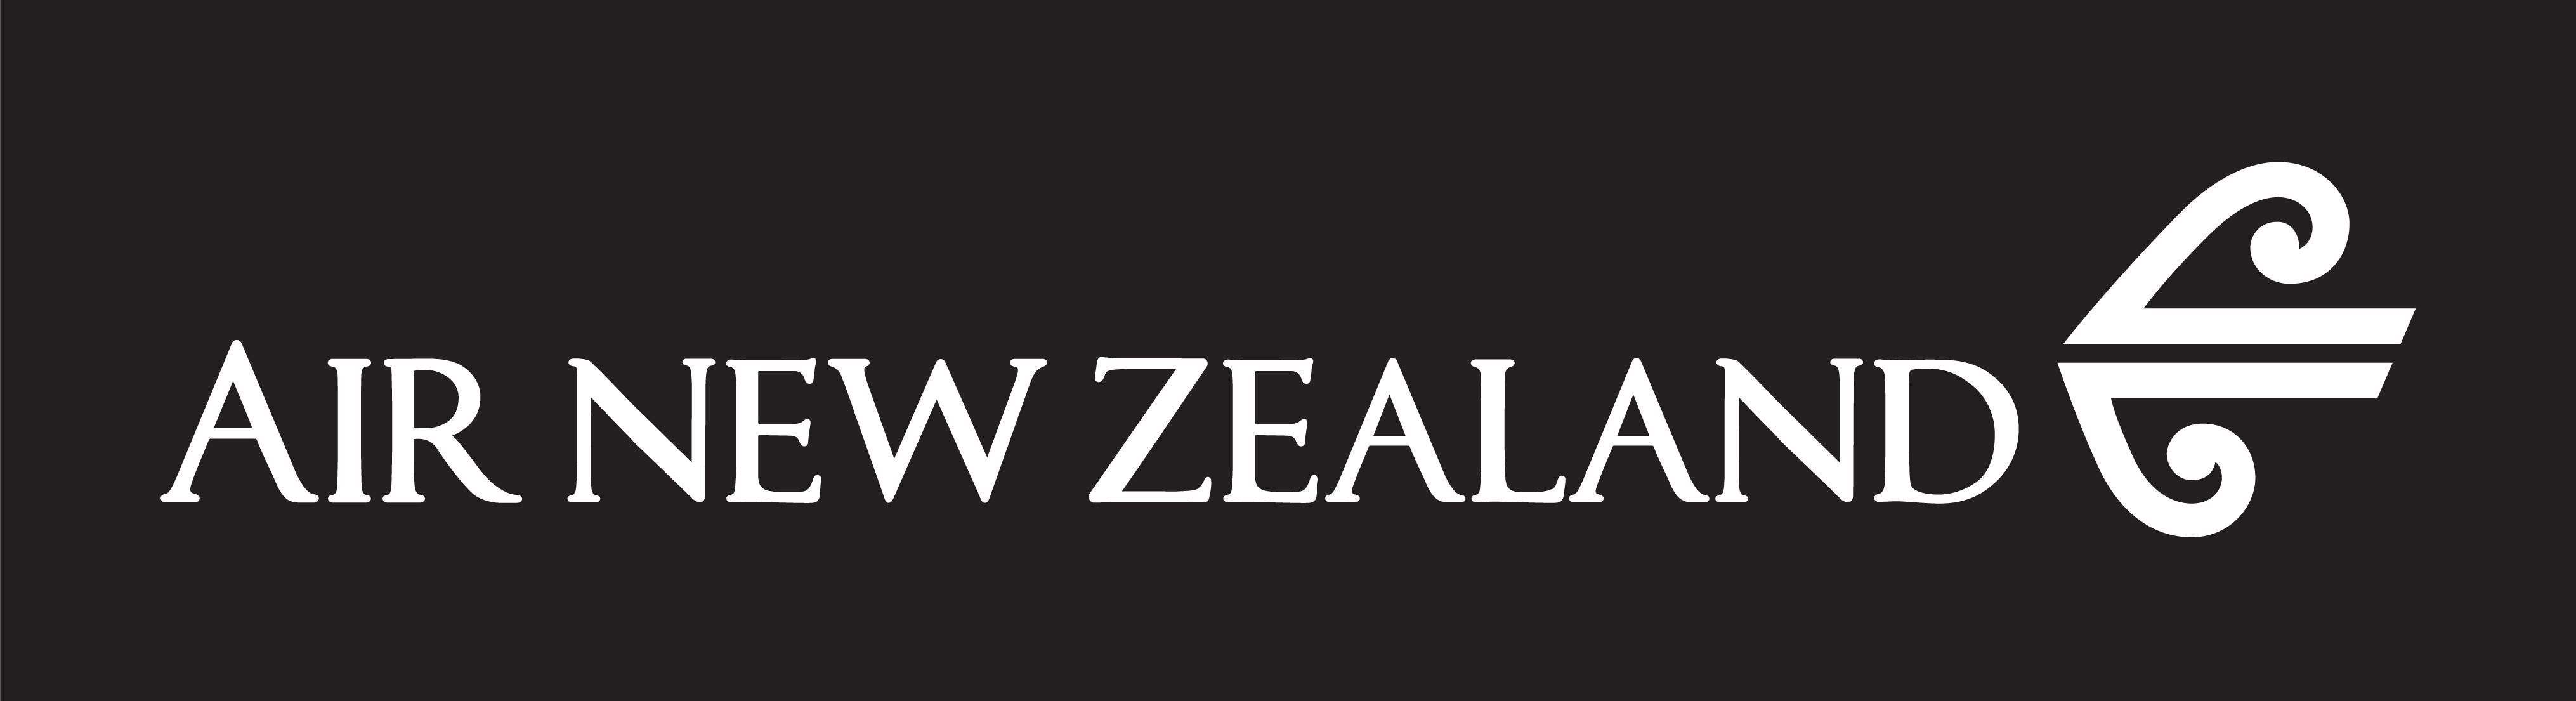 Air New Zealand - Air New Zealand PNG